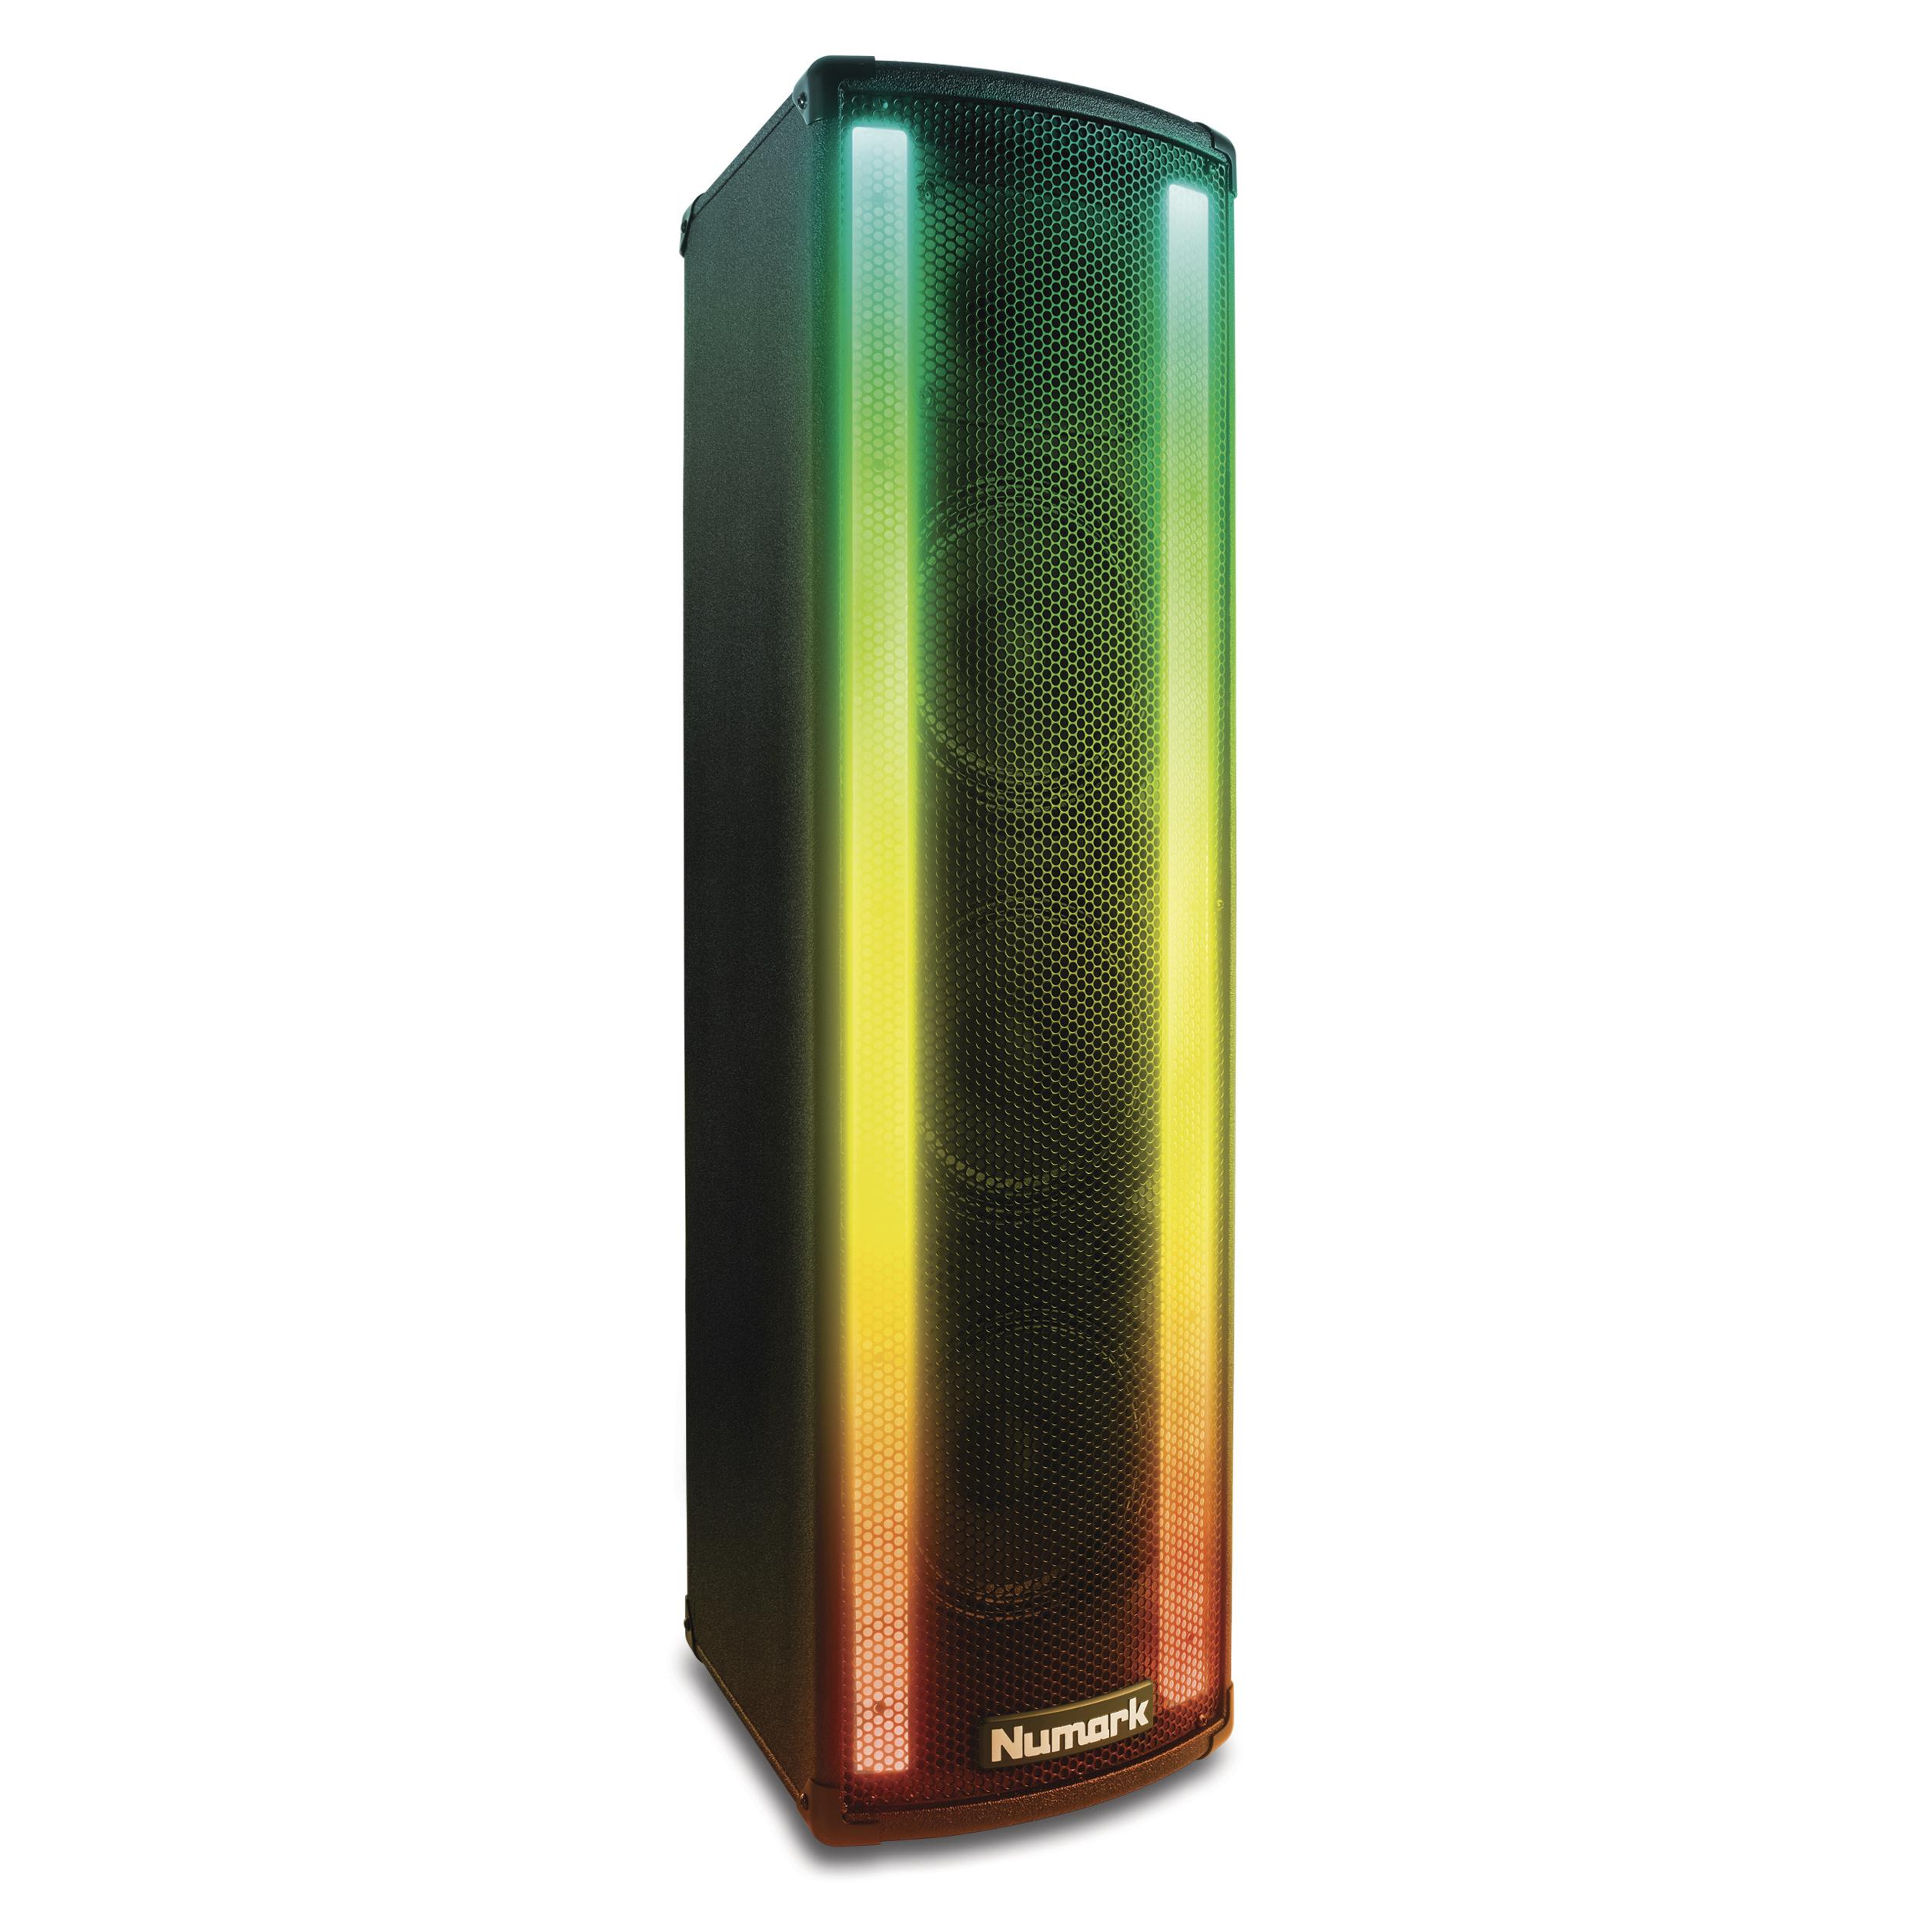 Numark Lightwave 235163